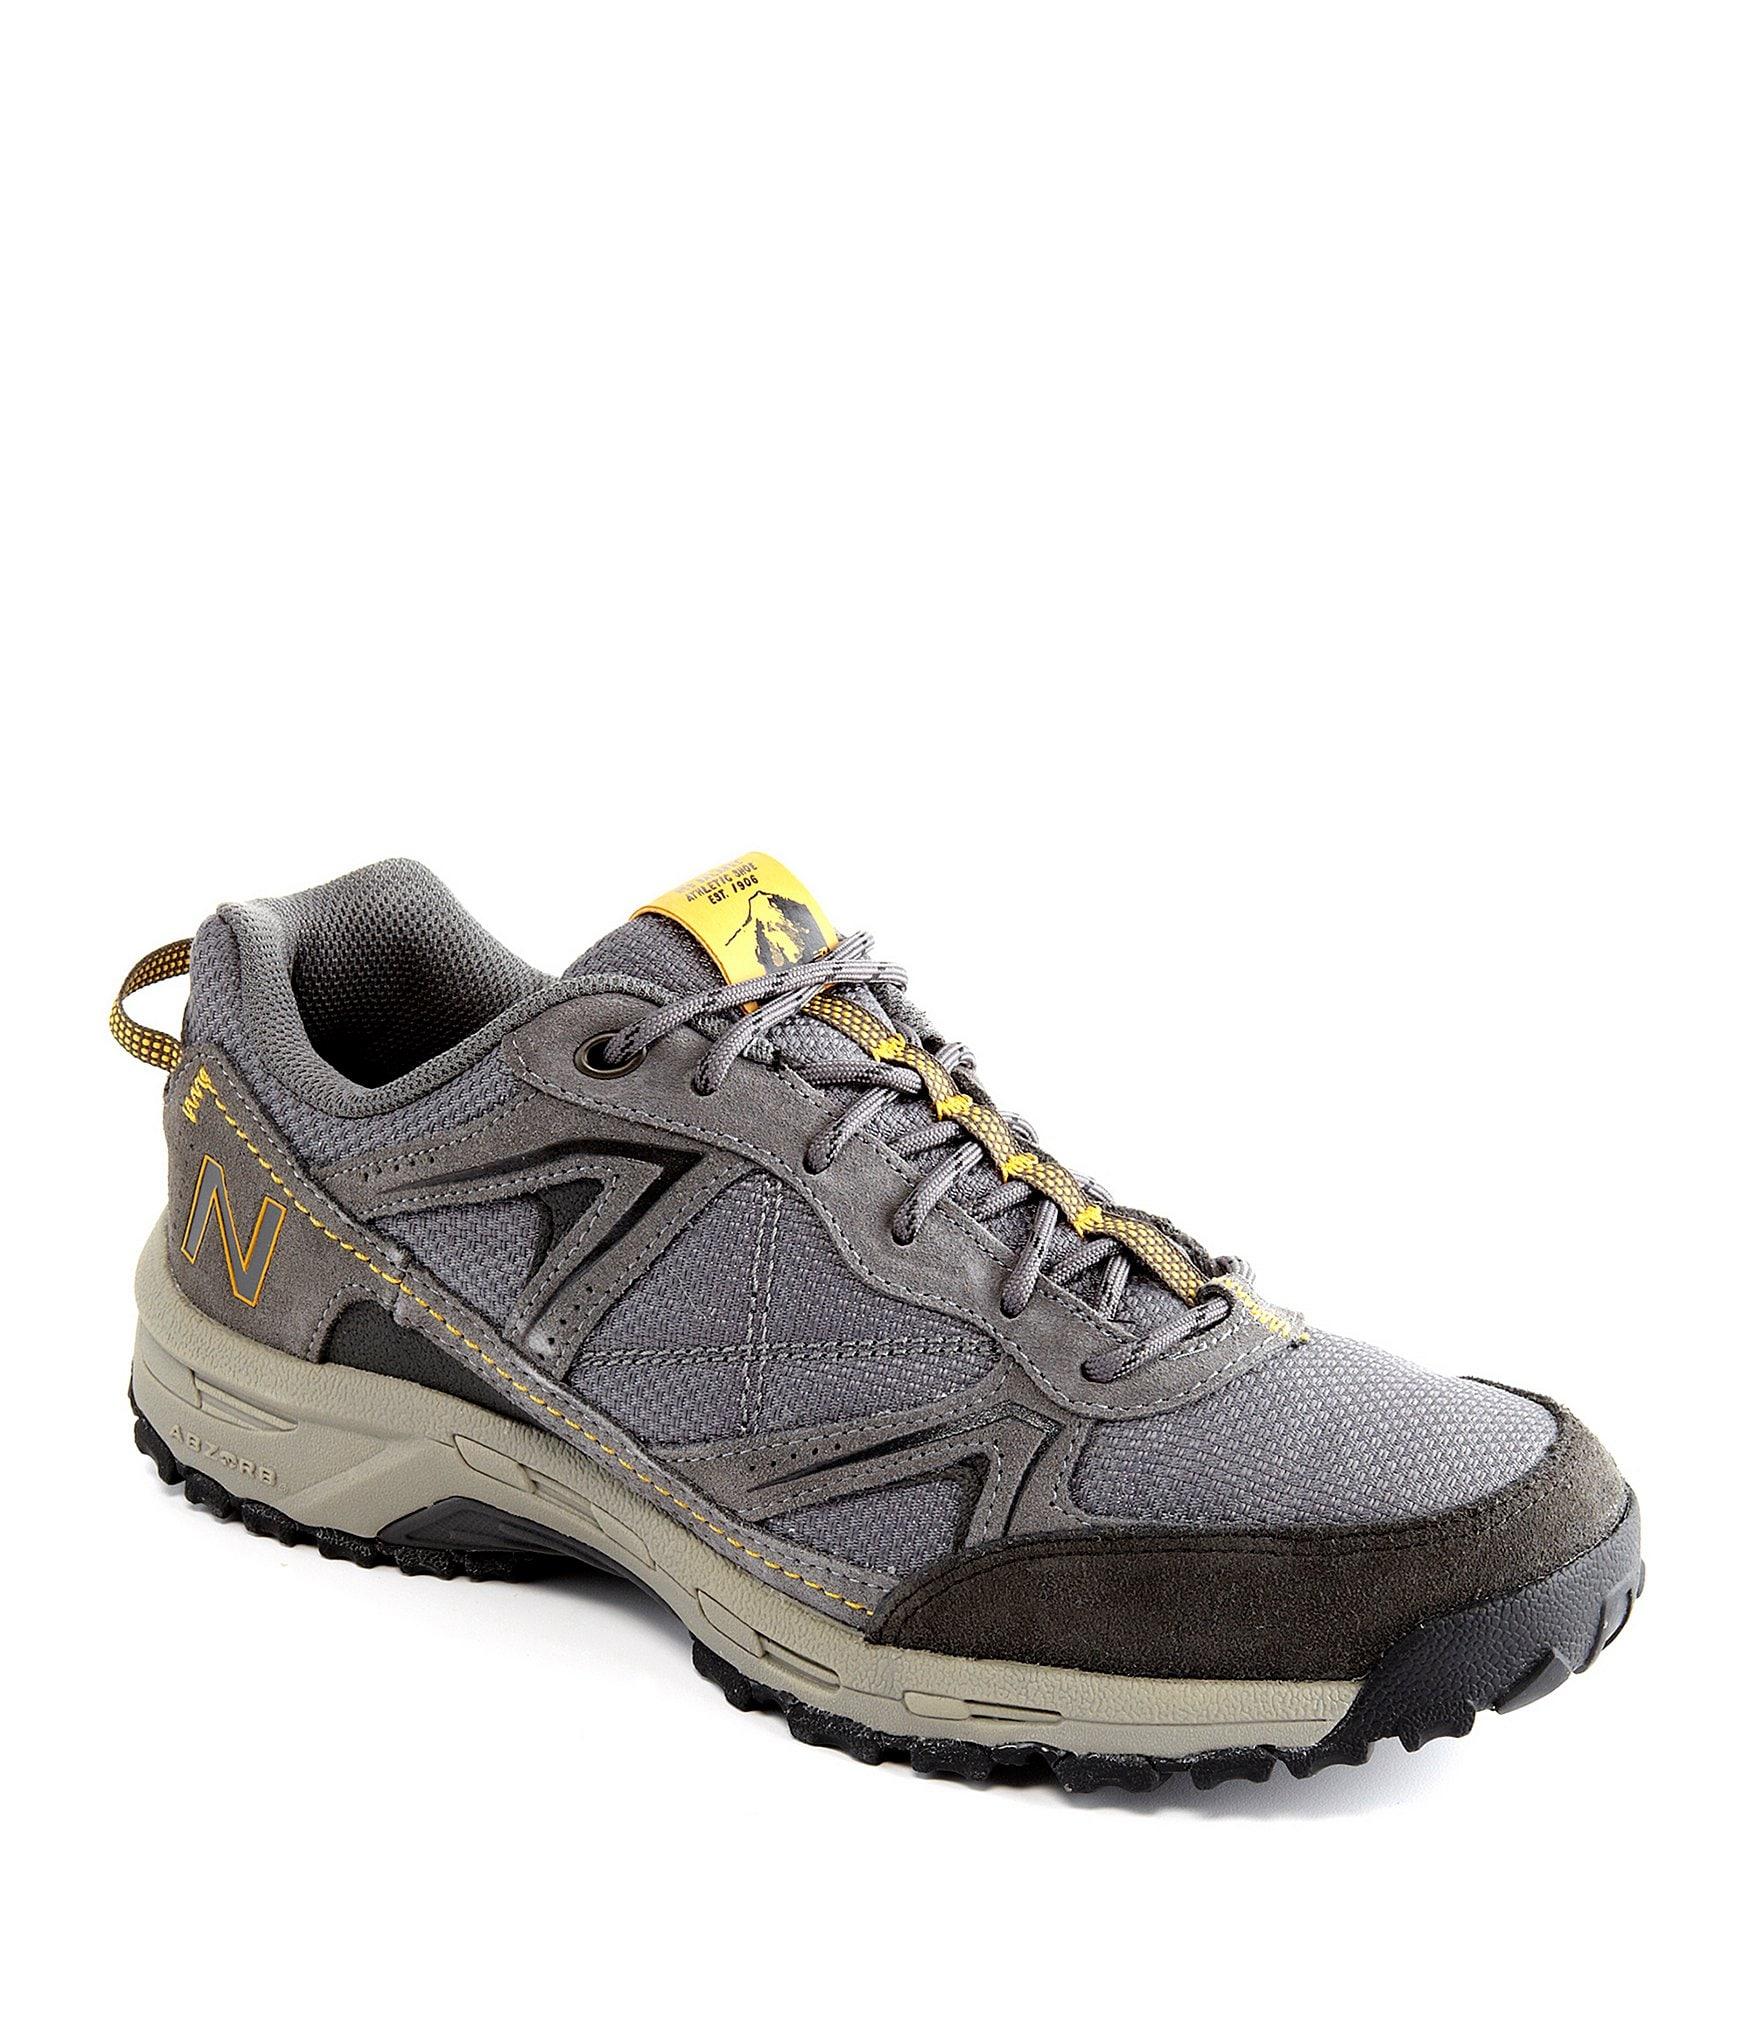 new balance 574 boot